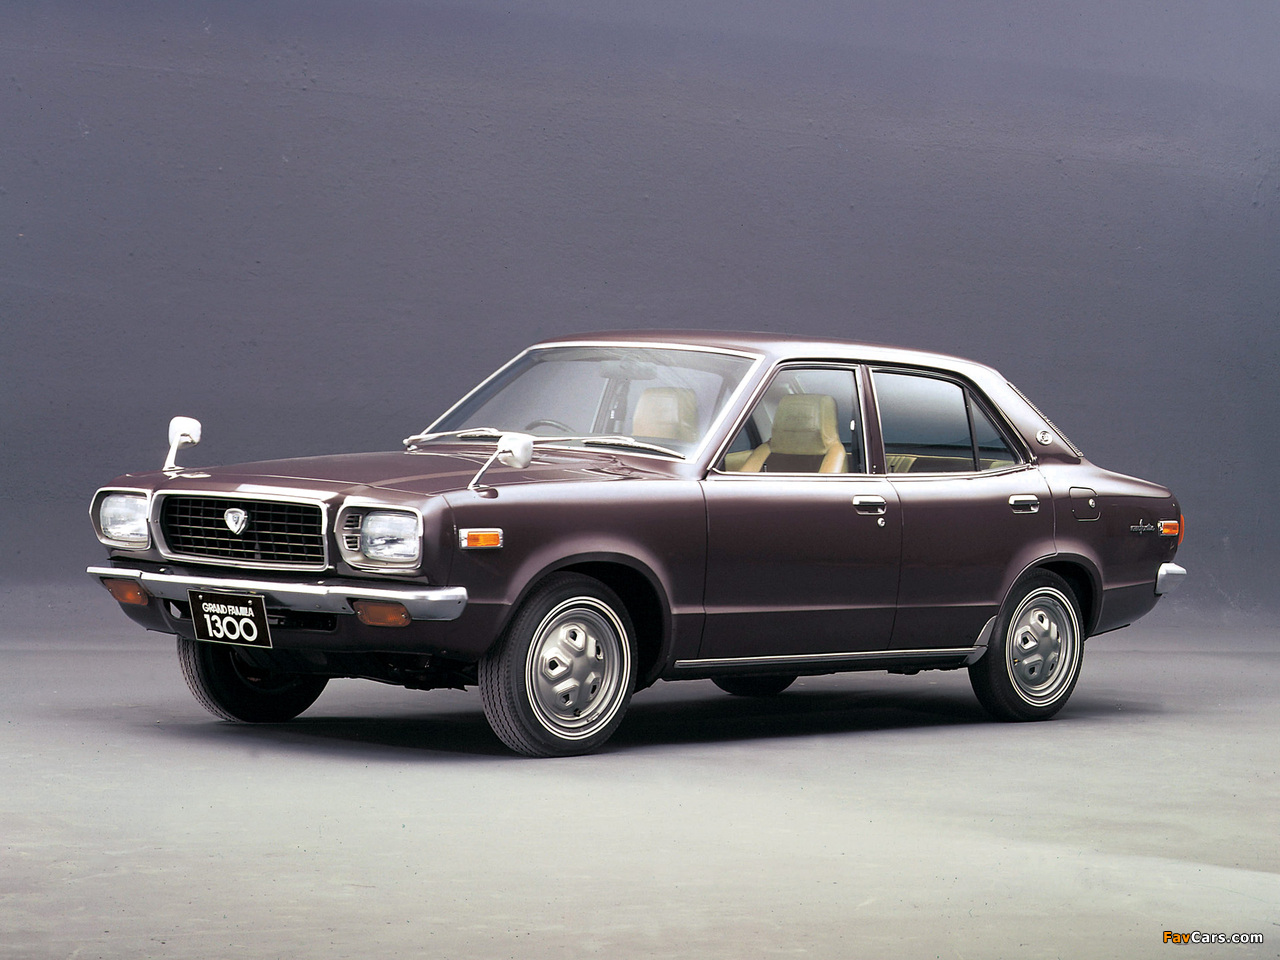 Mazda Grand Familia 1300 1971 images (1280 x 960)